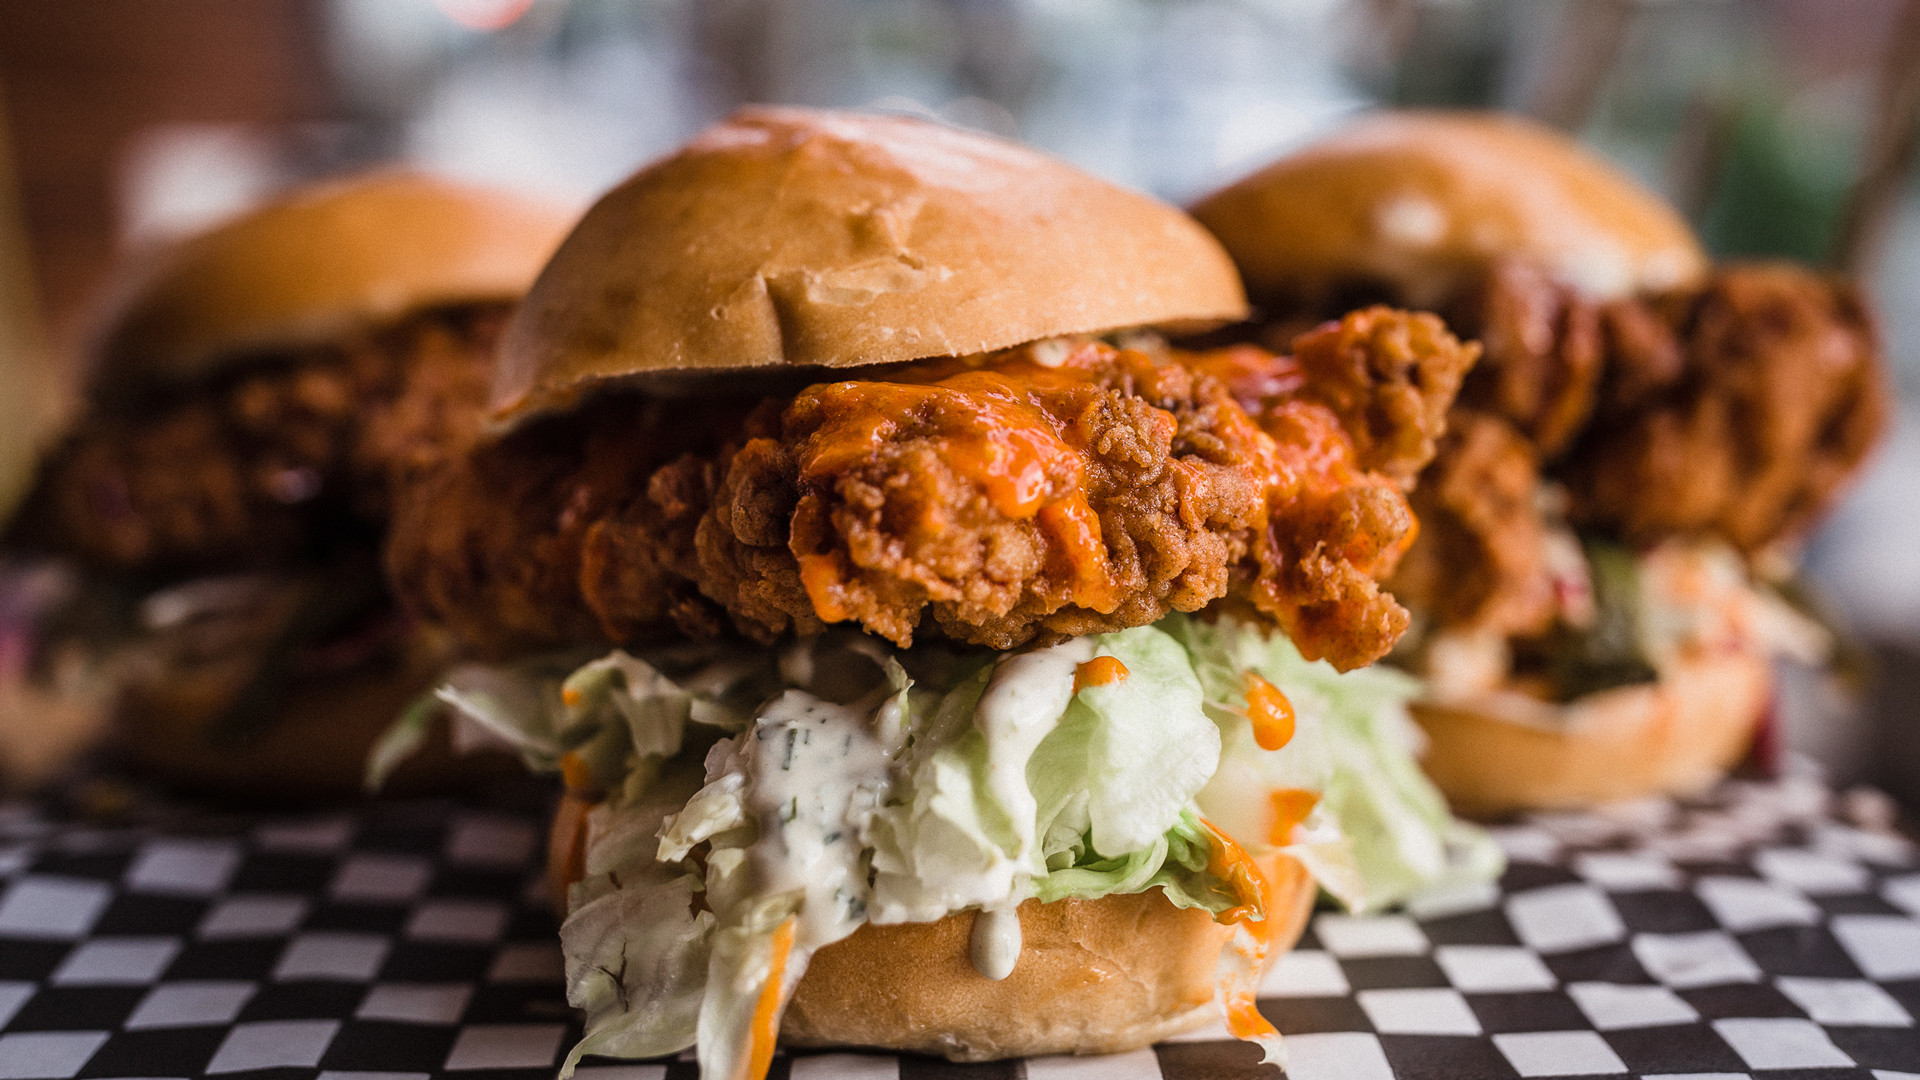 The best fried chicken sandwiches in Toronto | A Buffalo fried chicken sandwich from Knuckle Sandwich